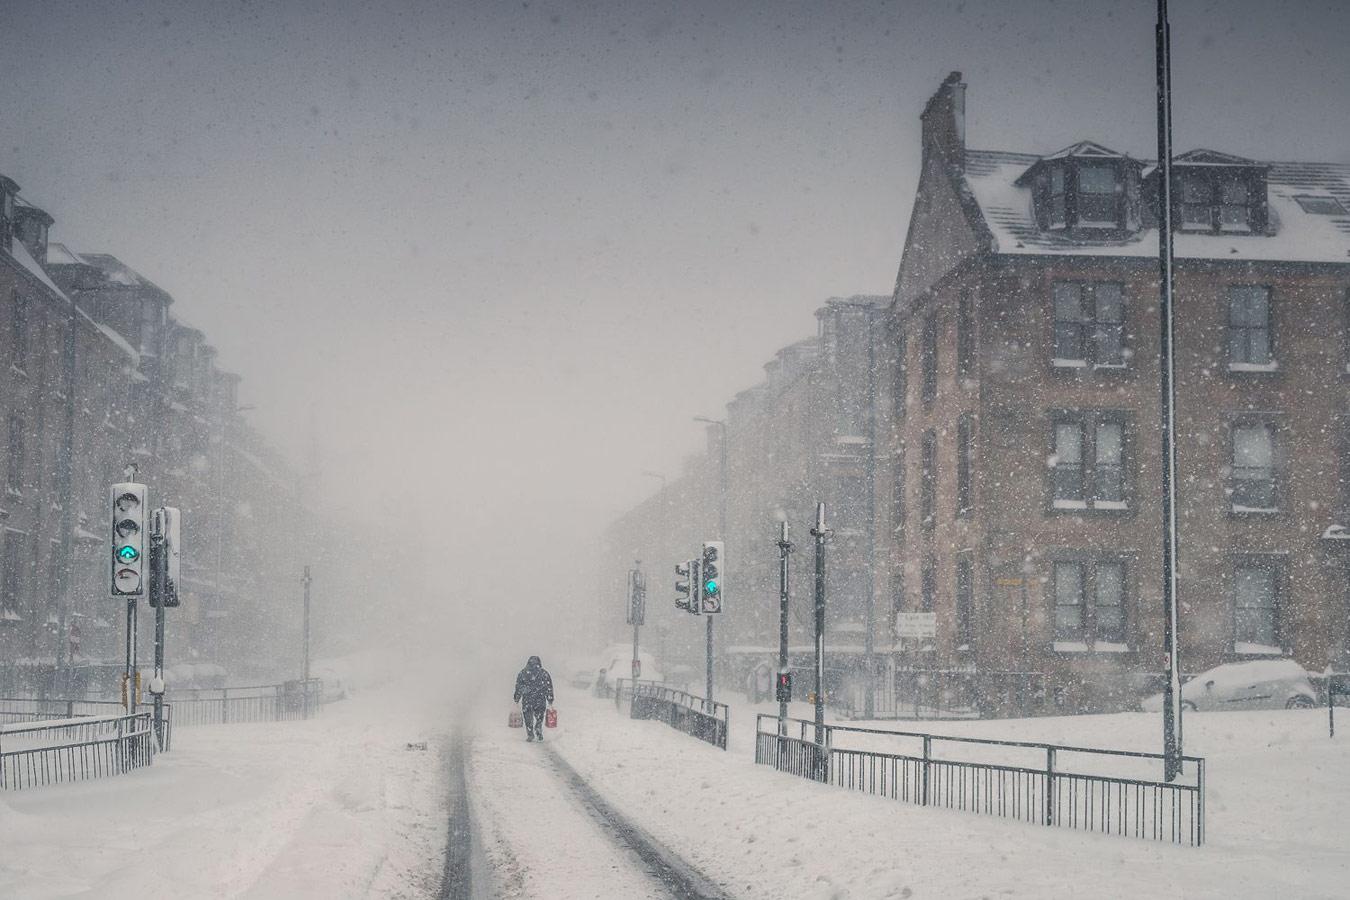 Депеша, © Нил Барр, Фотоконкурс «Погодный фотограф года» — Weather Photographer of the Year